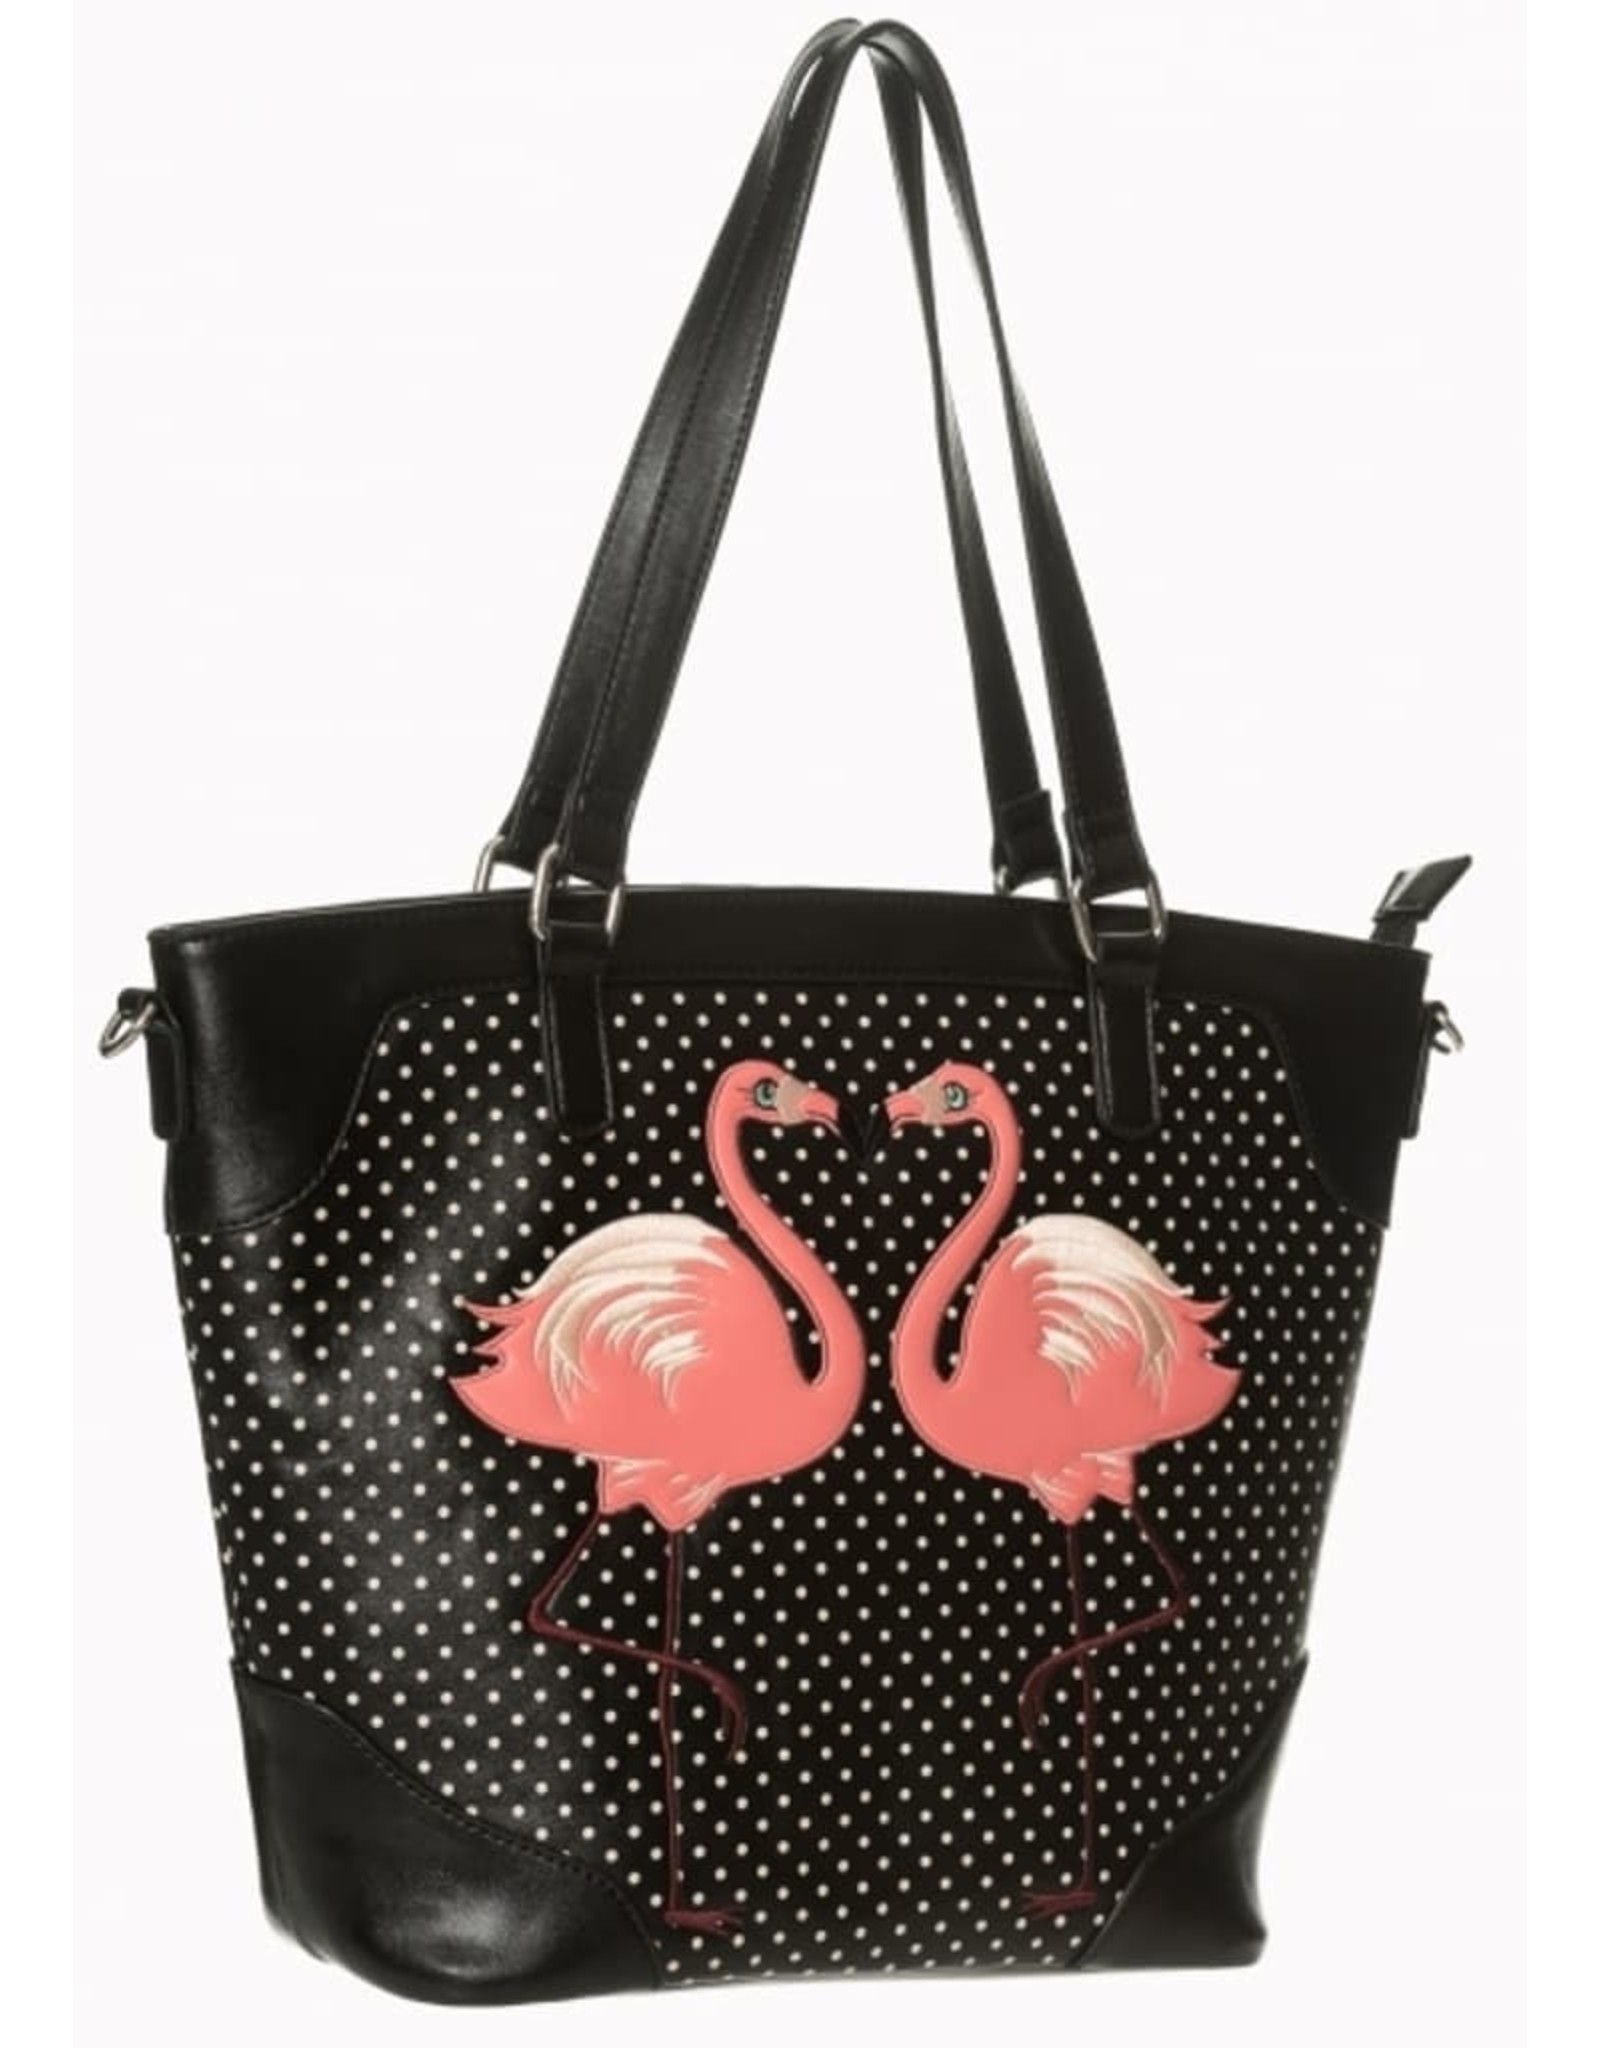 Vintage Retro bags  Vintage bags - Banned Dancing Days Blair